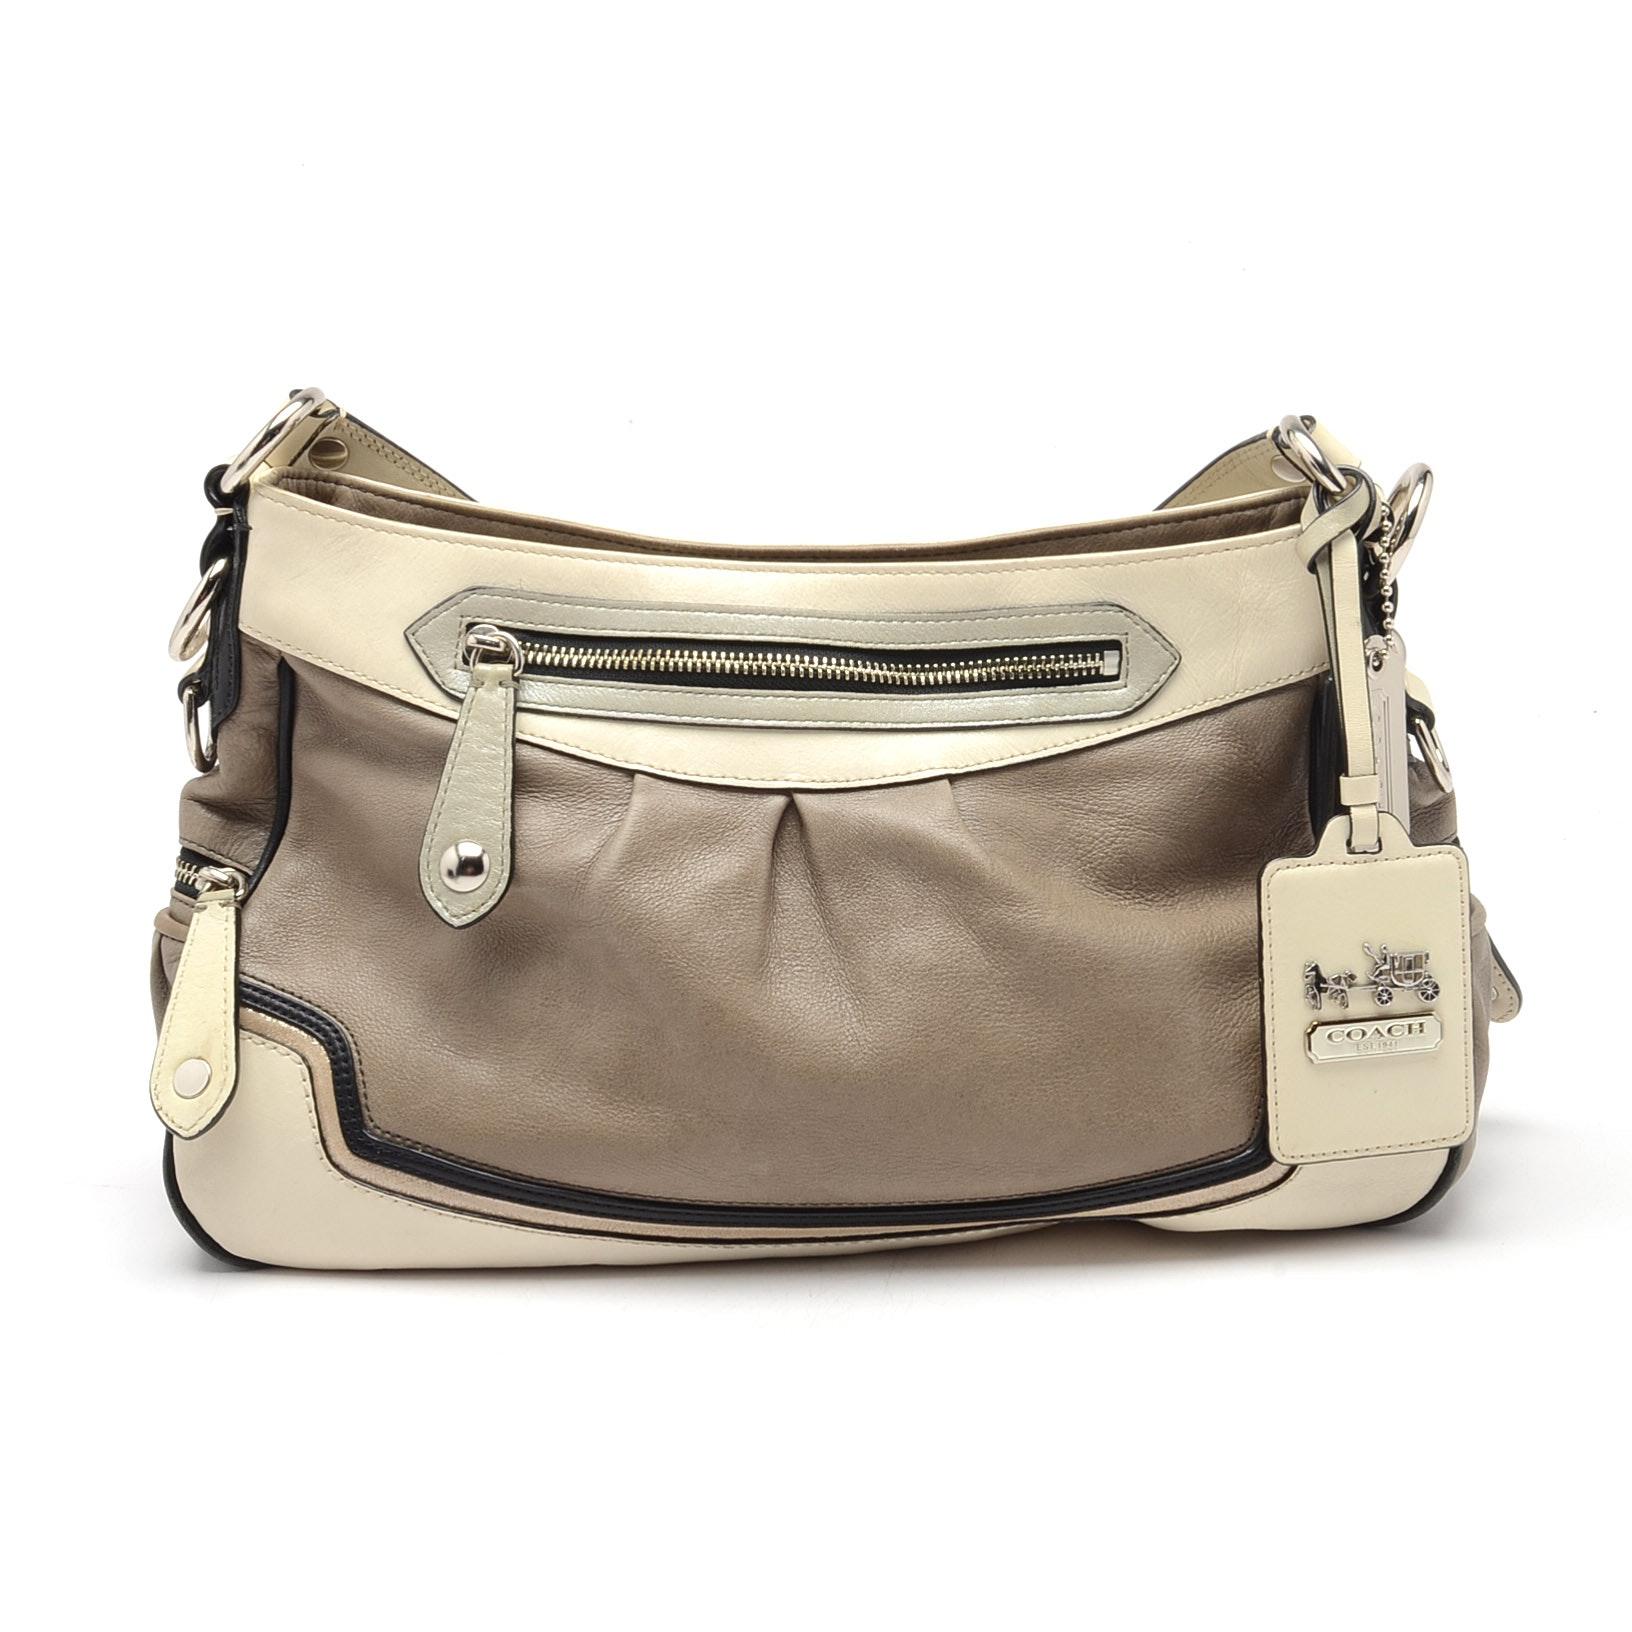 Coach Madison Spectater Handbag